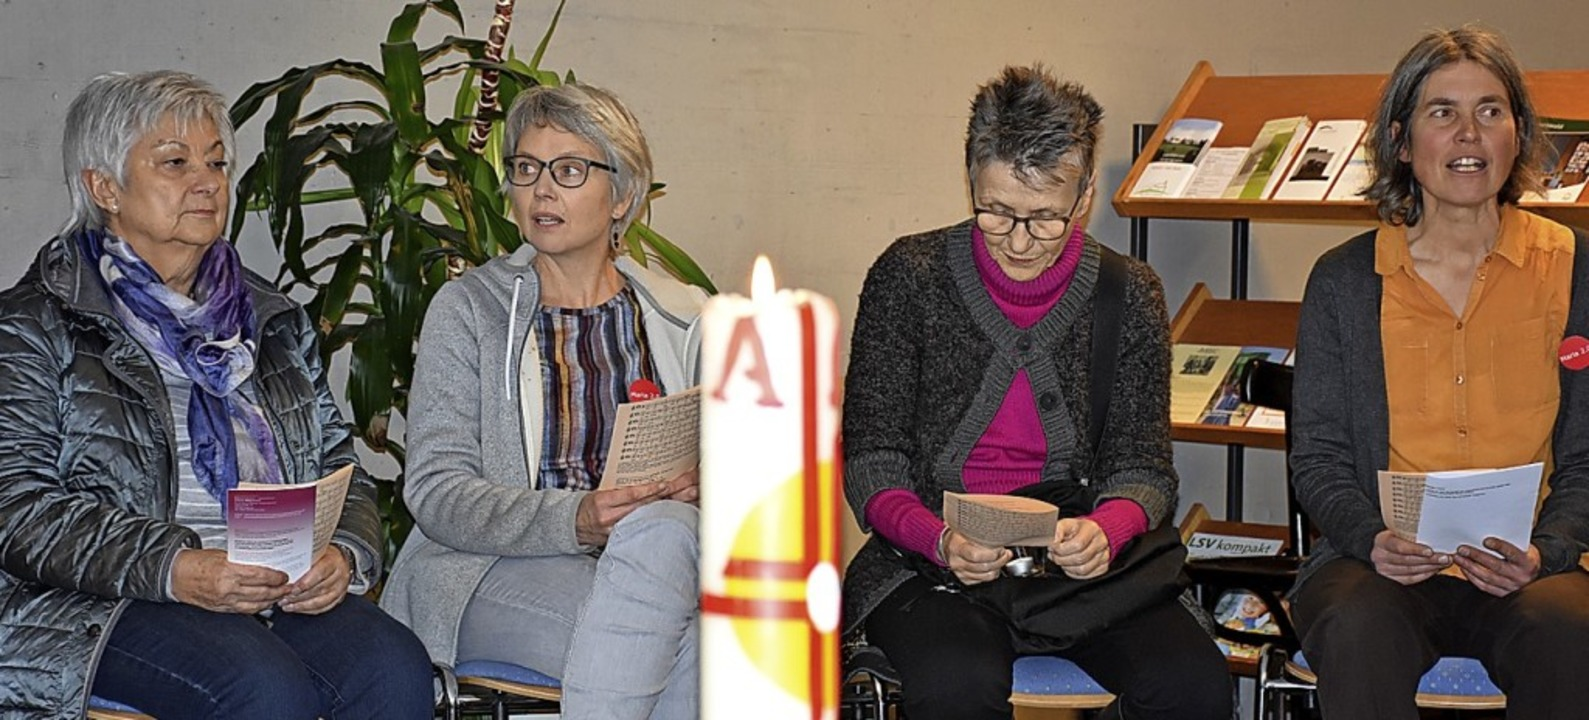 Gedankenaustausch im Pfarrheim   | Foto: Thomas Biniossek